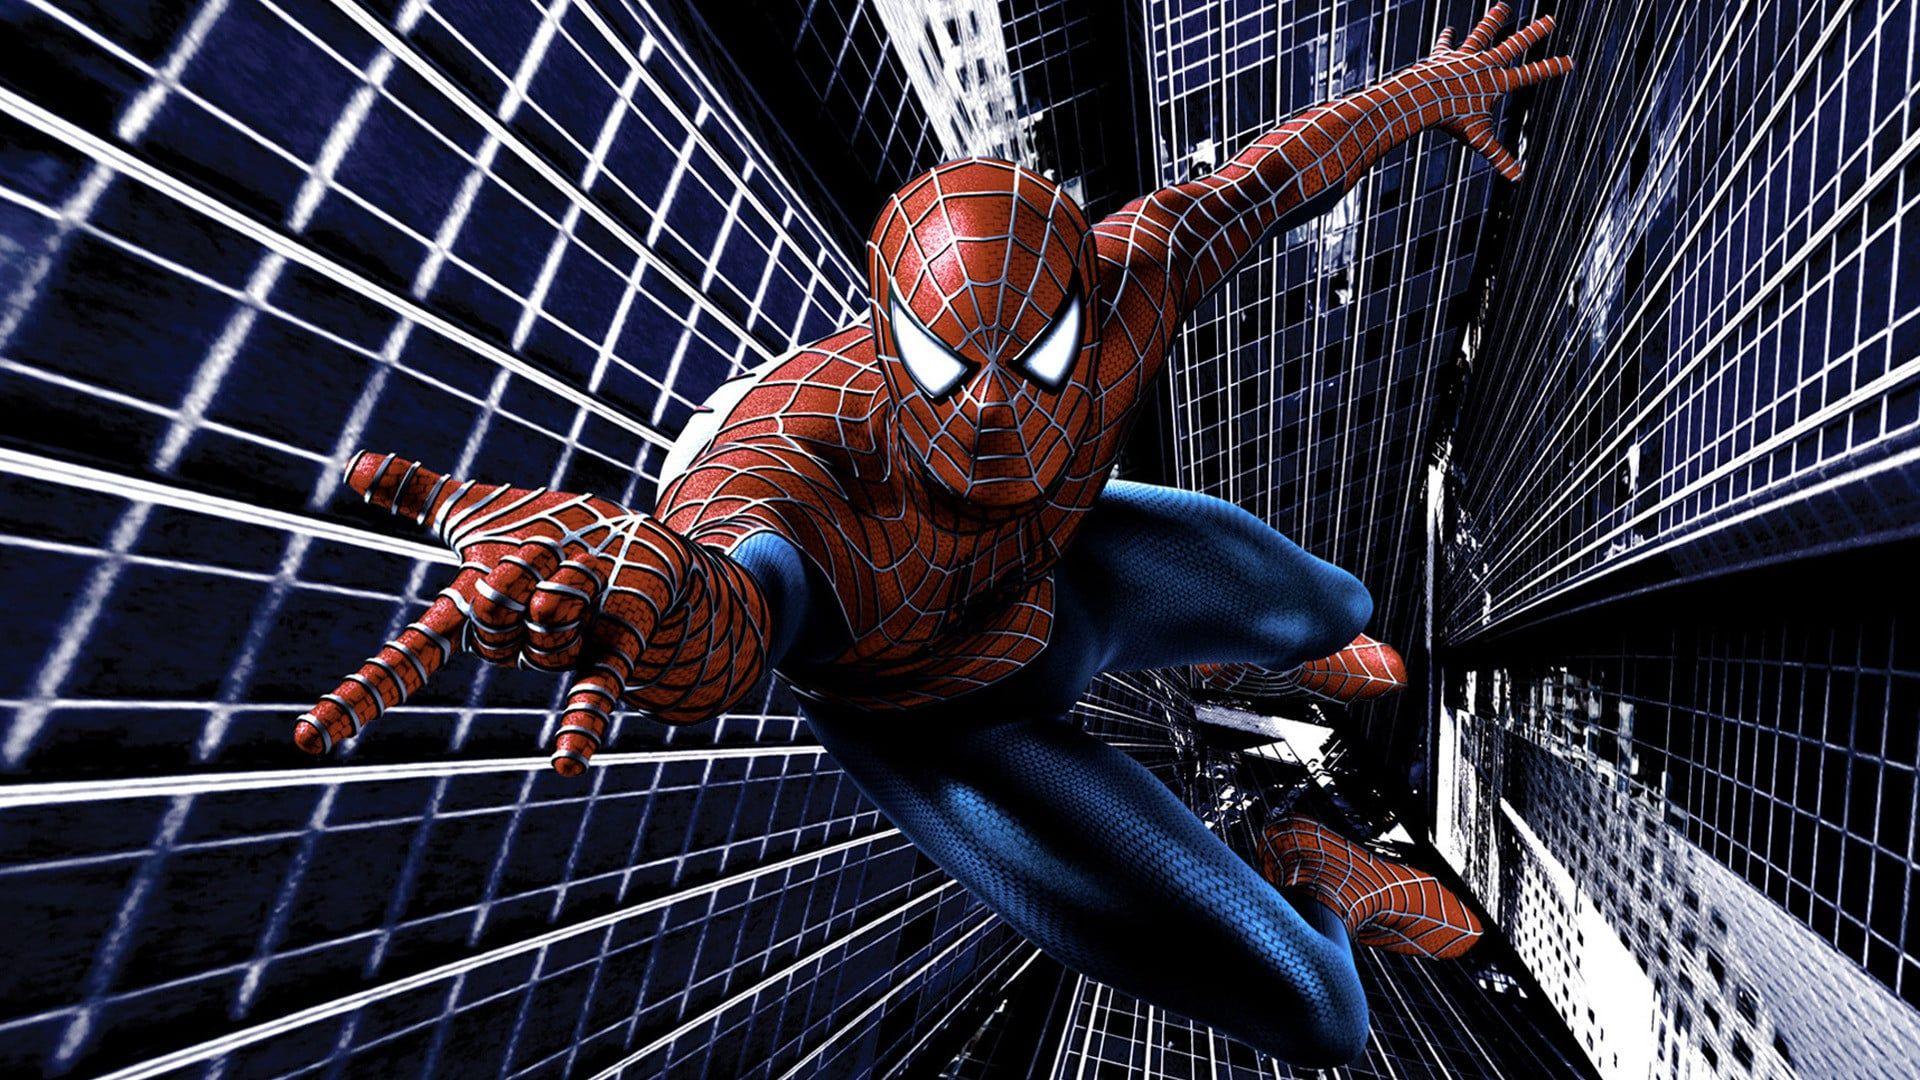 Altadefinizione Spider Man 2002 Streaming Ita Cb01 Film Completo Cinema Guarda Spider Man Italiano 2002 Film Str Marvel Heroes Spiderman Streaming Movies